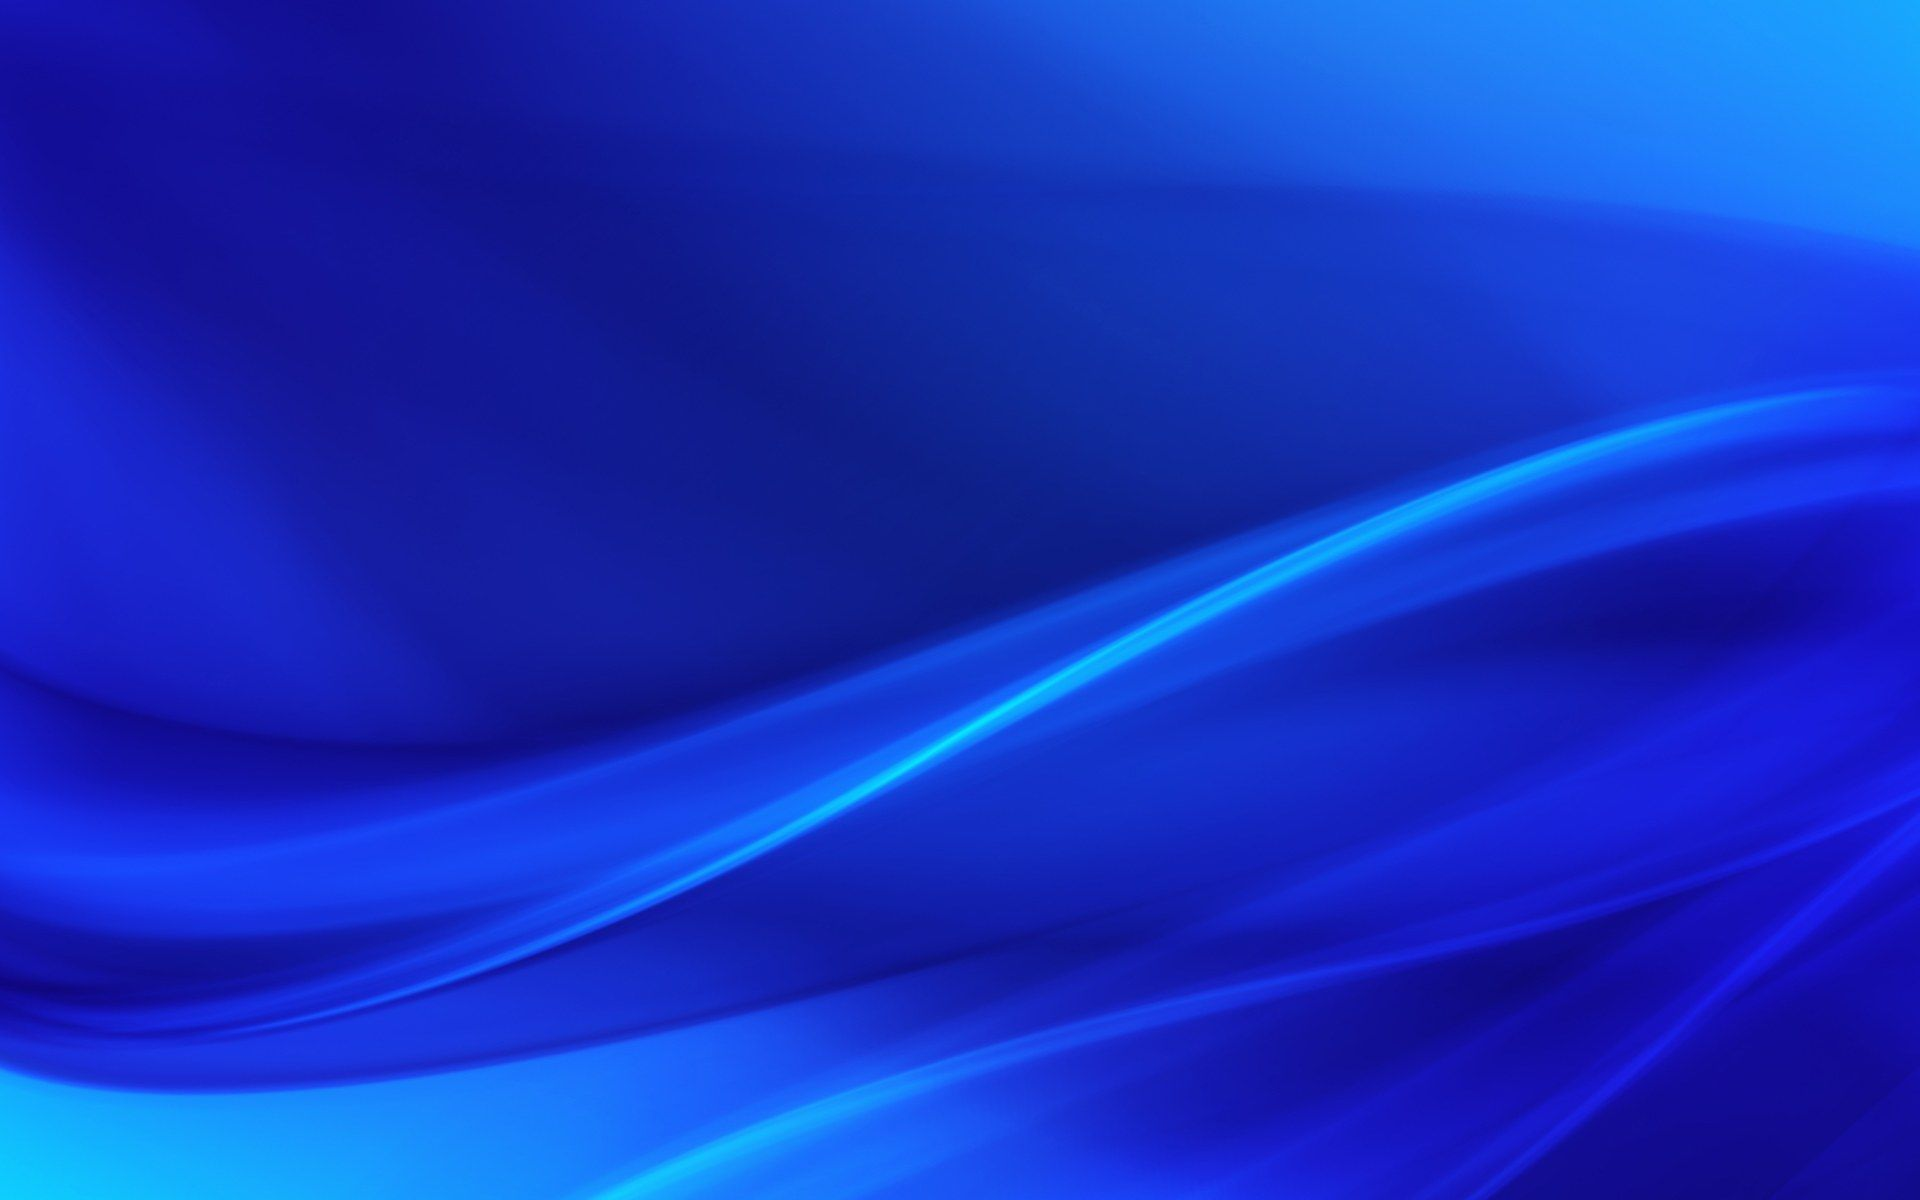 Cobalt Blue Abstract Wallpaper: Art Blue Color Wallpaper HD Wallpaper